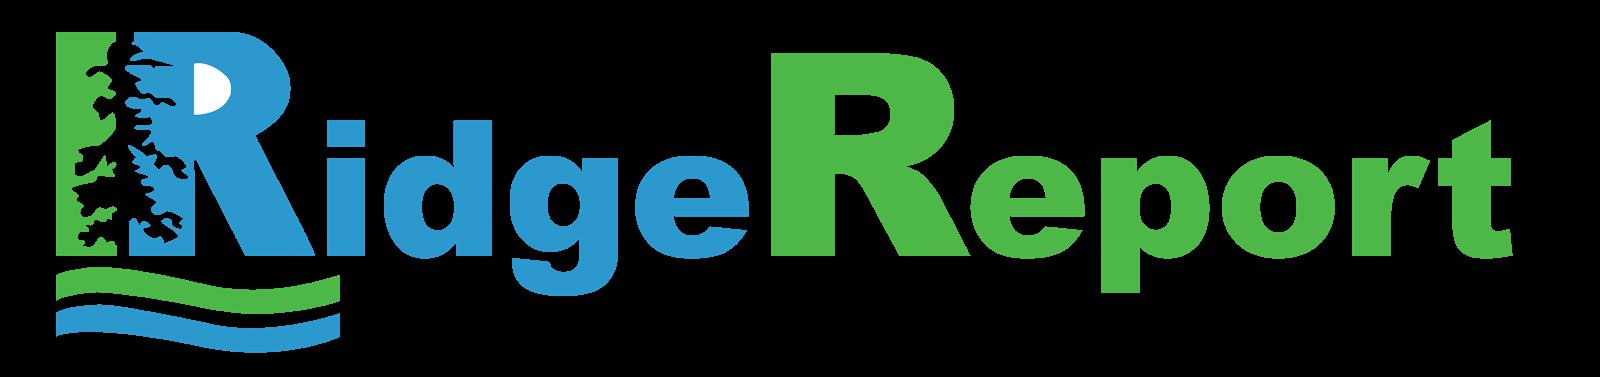 Ridge Report